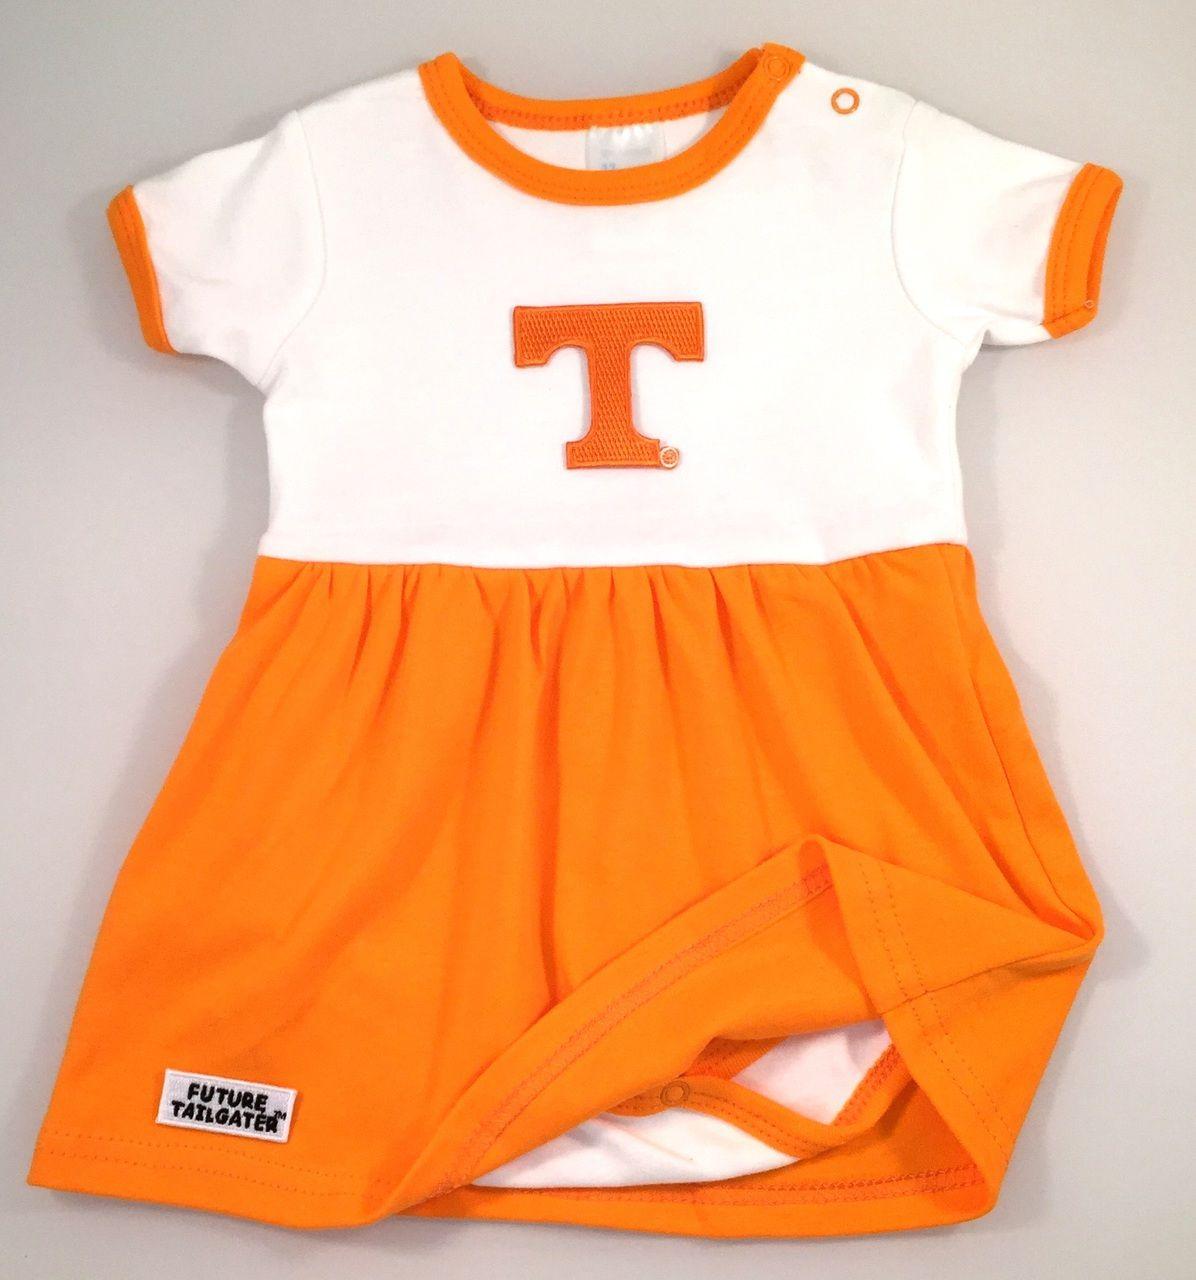 Cheerleader Baby Onesie Future Tailgater Iowa Hawkeyes Heads Up